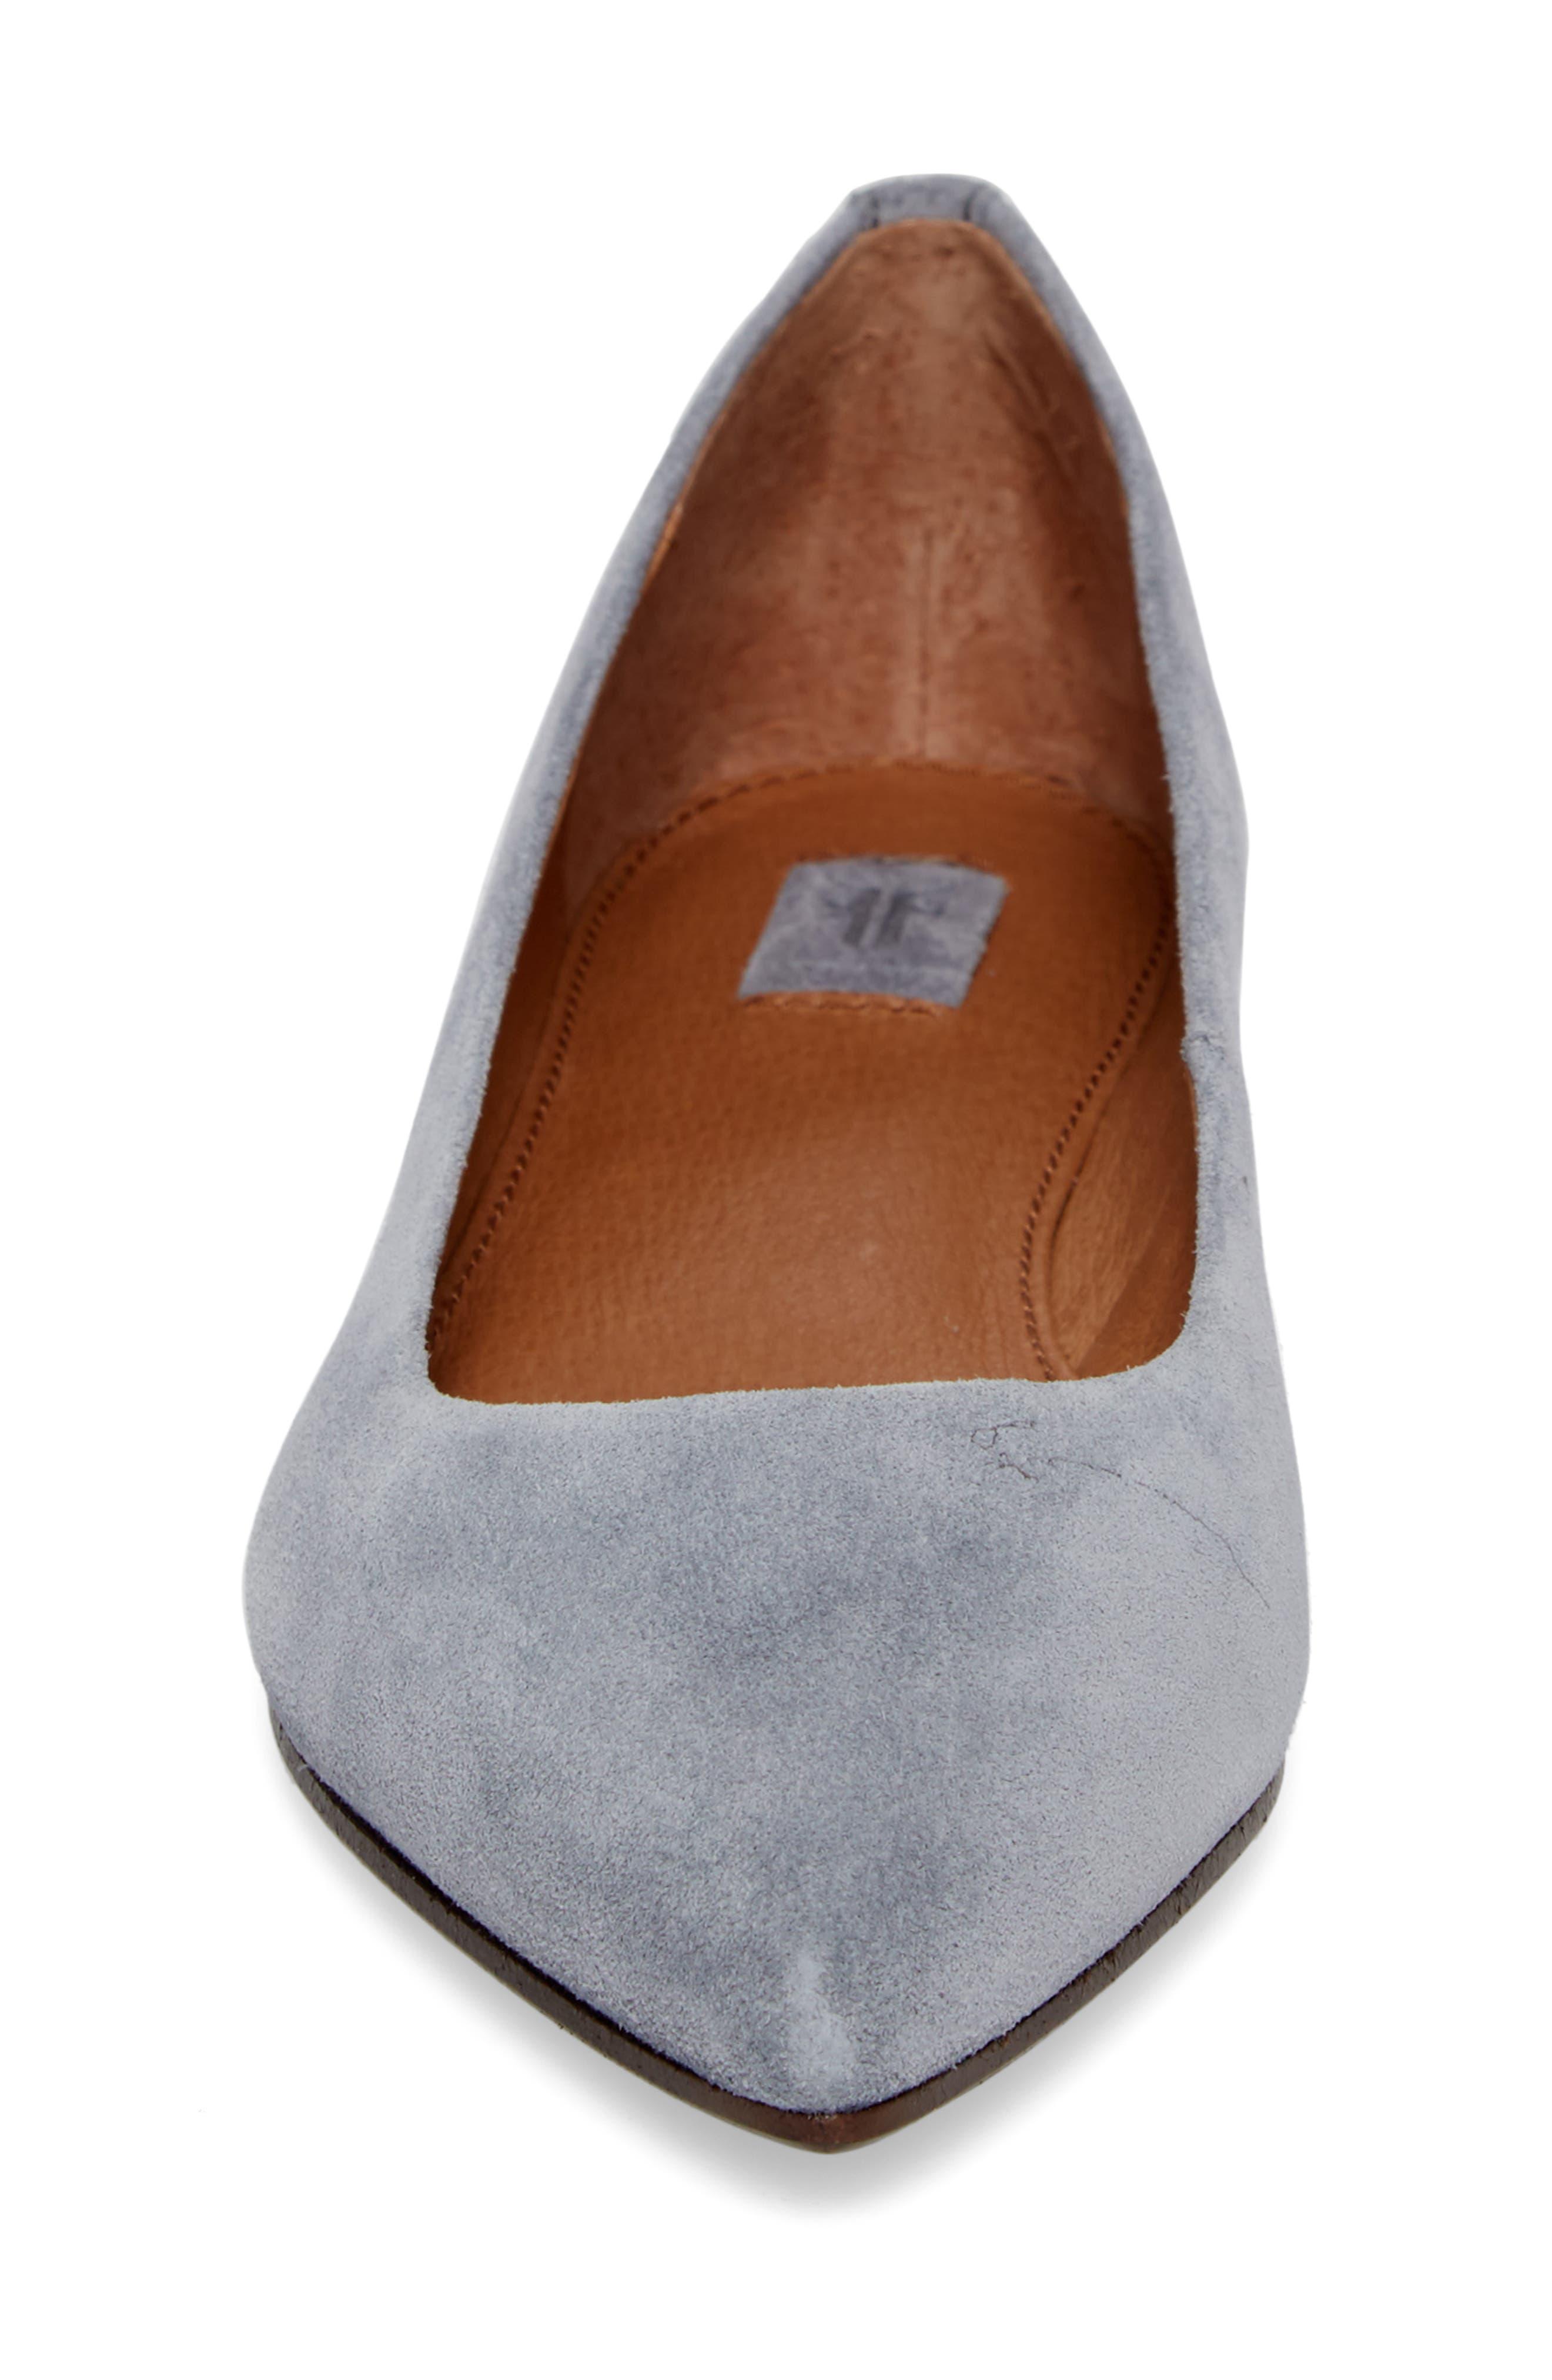 Sienna Pointy Toe Ballet Flat,                             Alternate thumbnail 12, color,